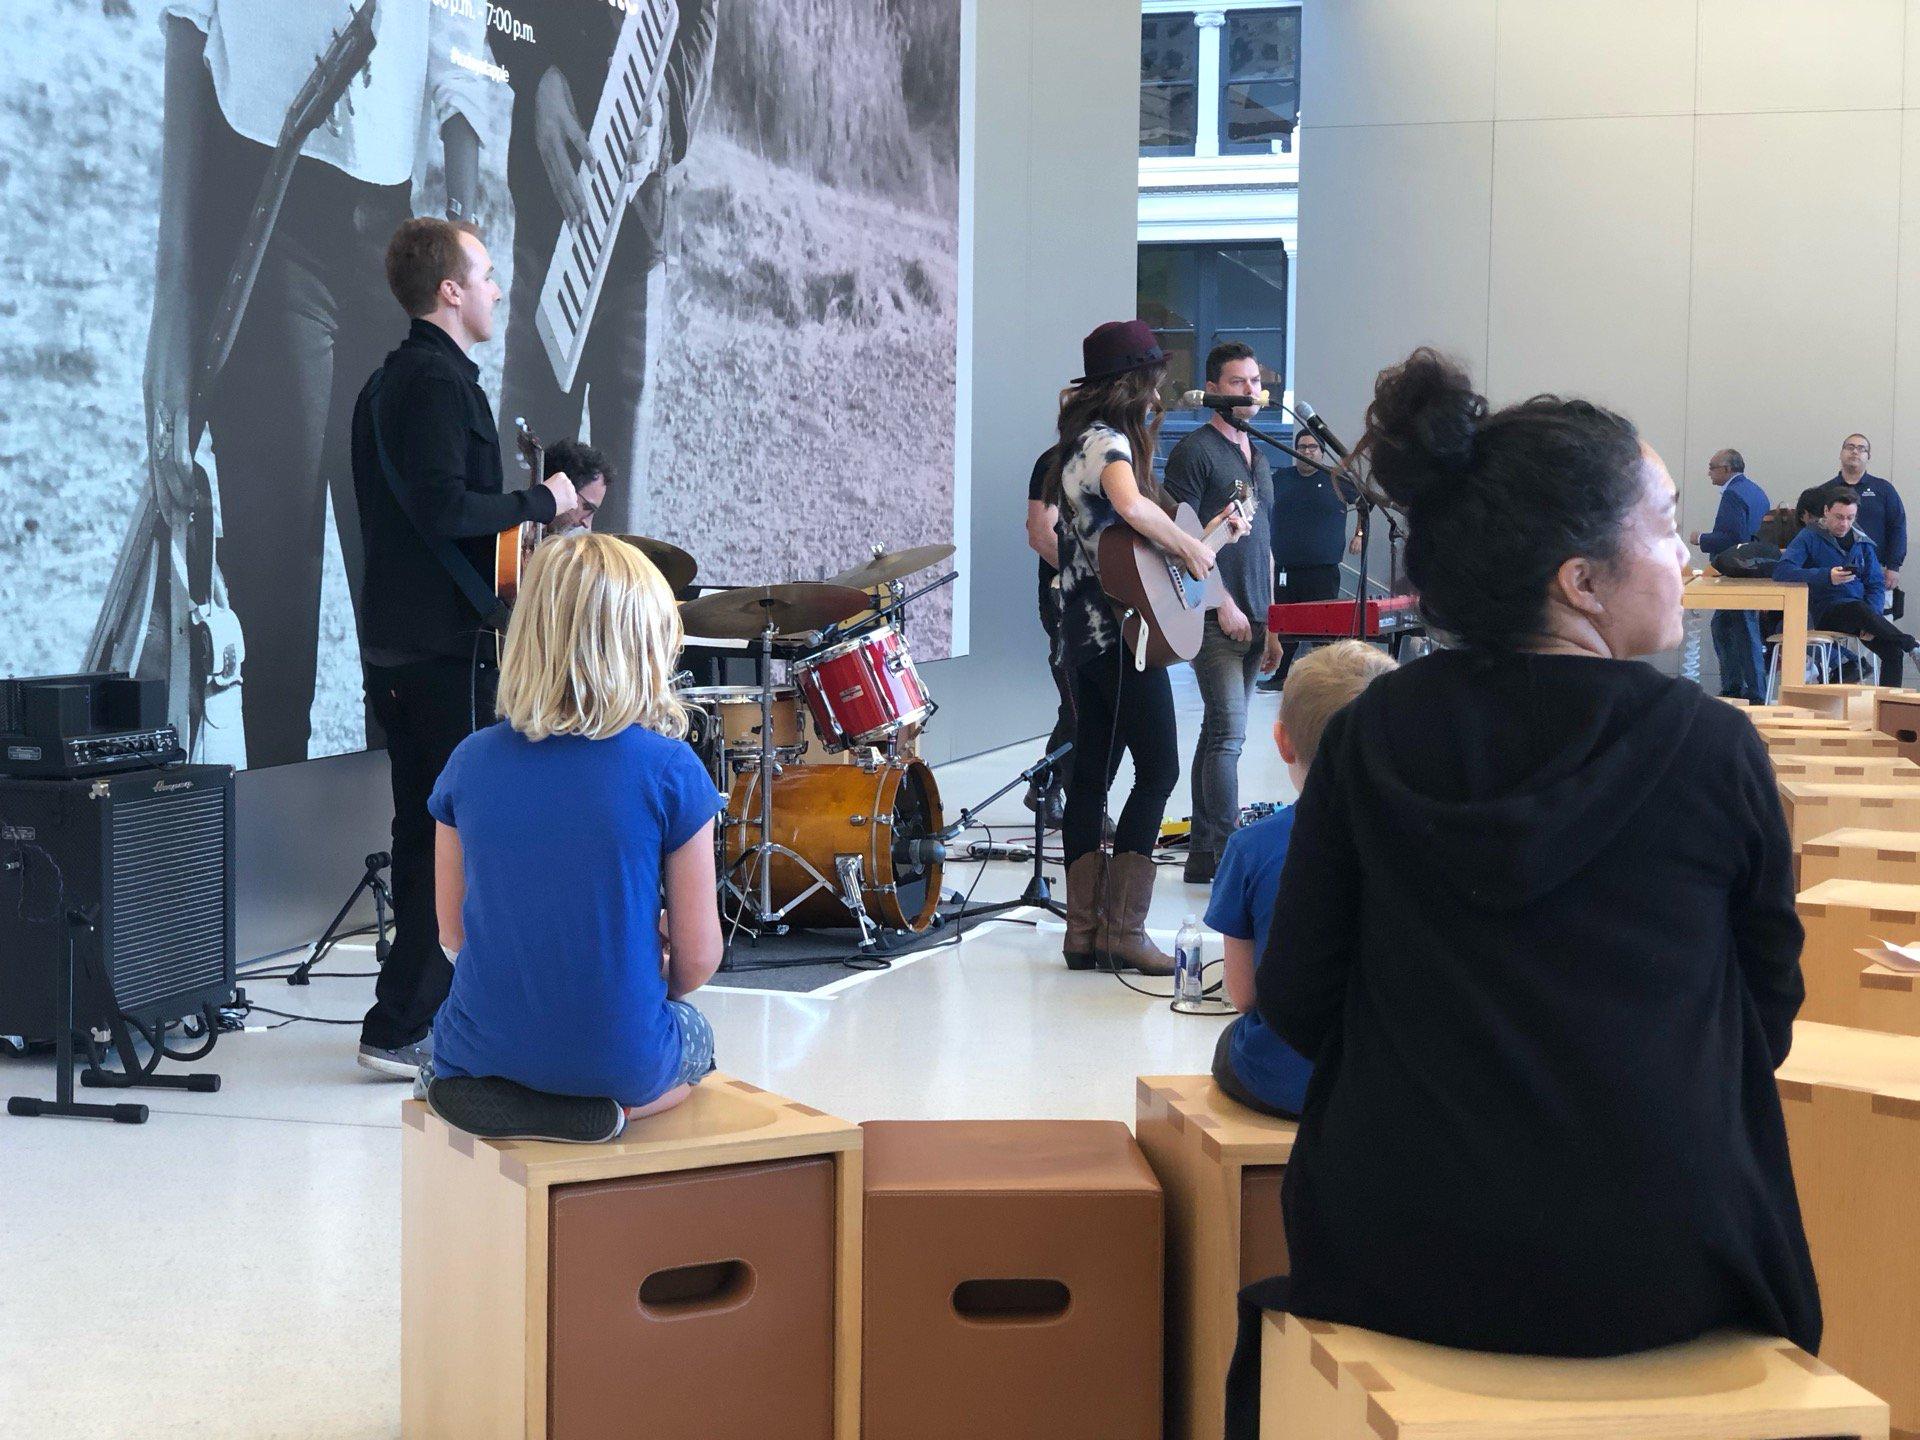 Live music Mullerette #todayatapple (at…